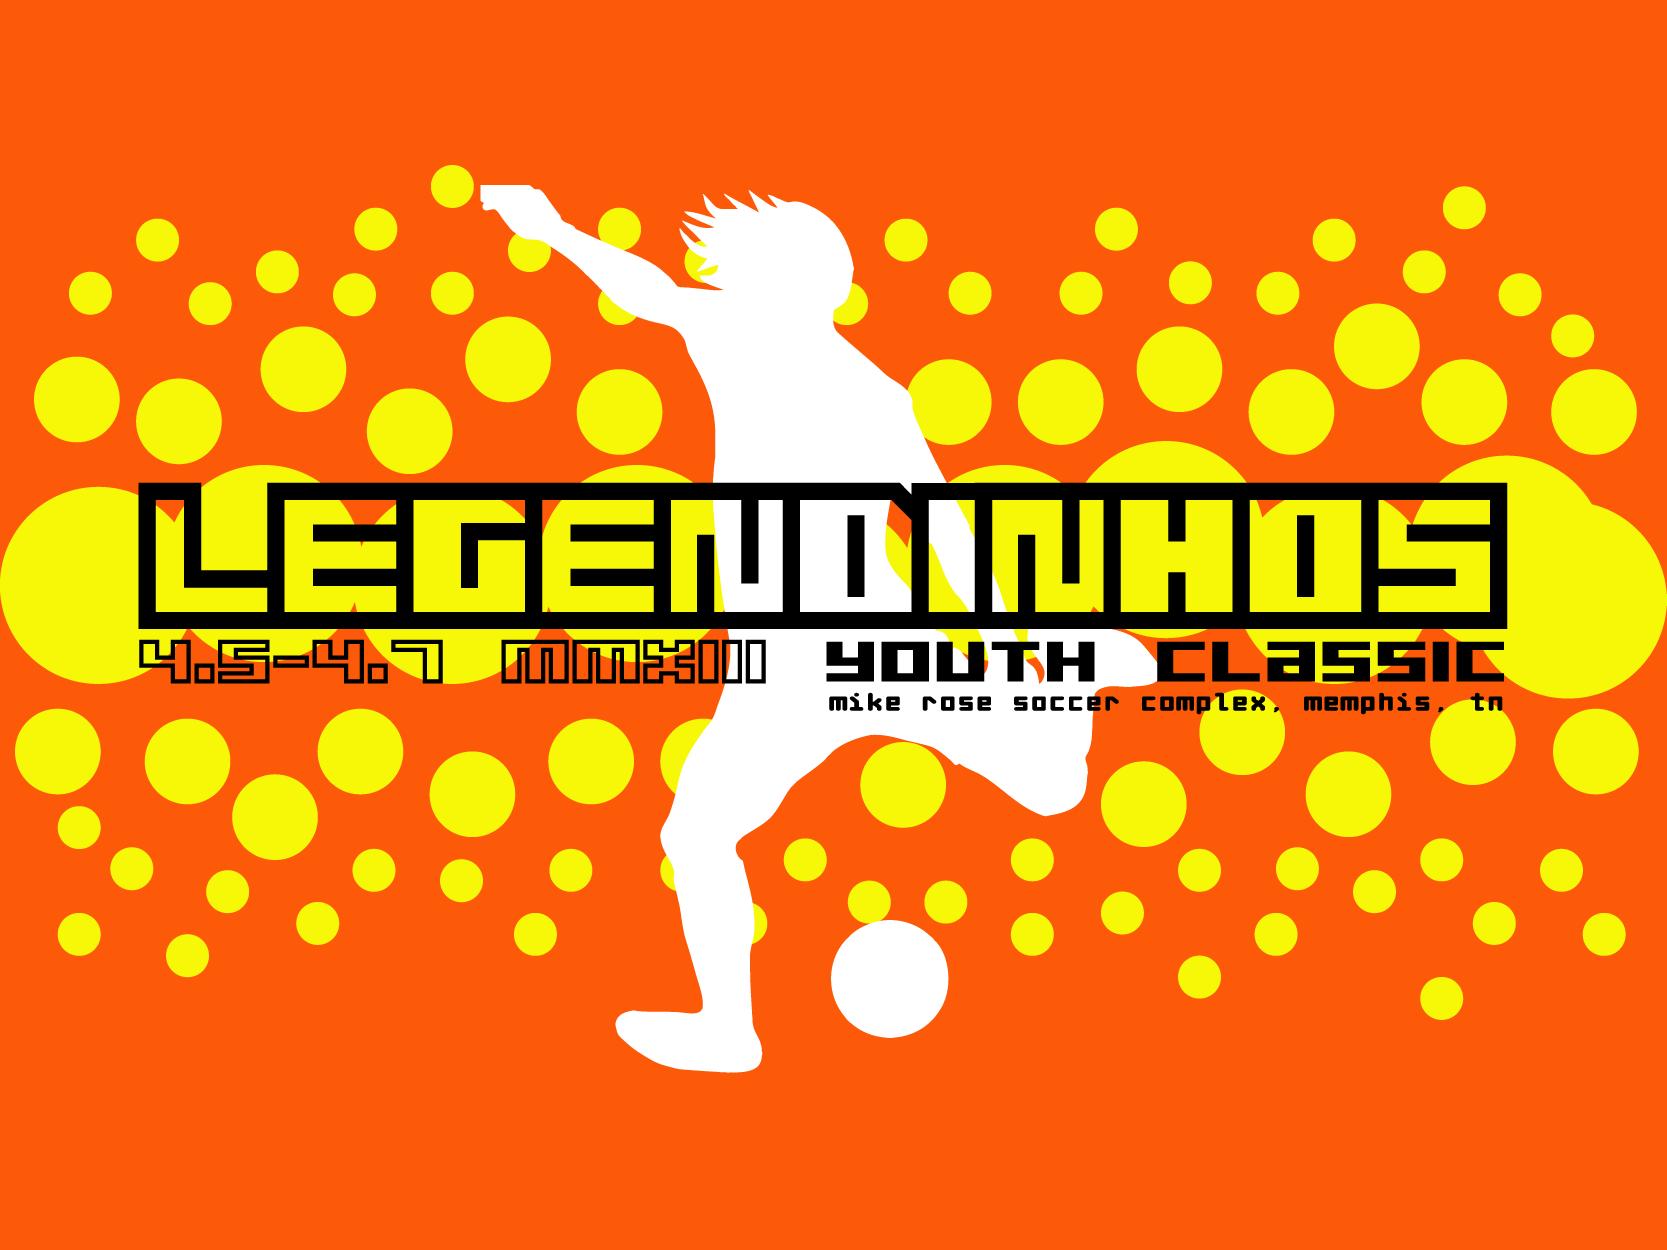 Legendinhos Youth Classic T-Shirts